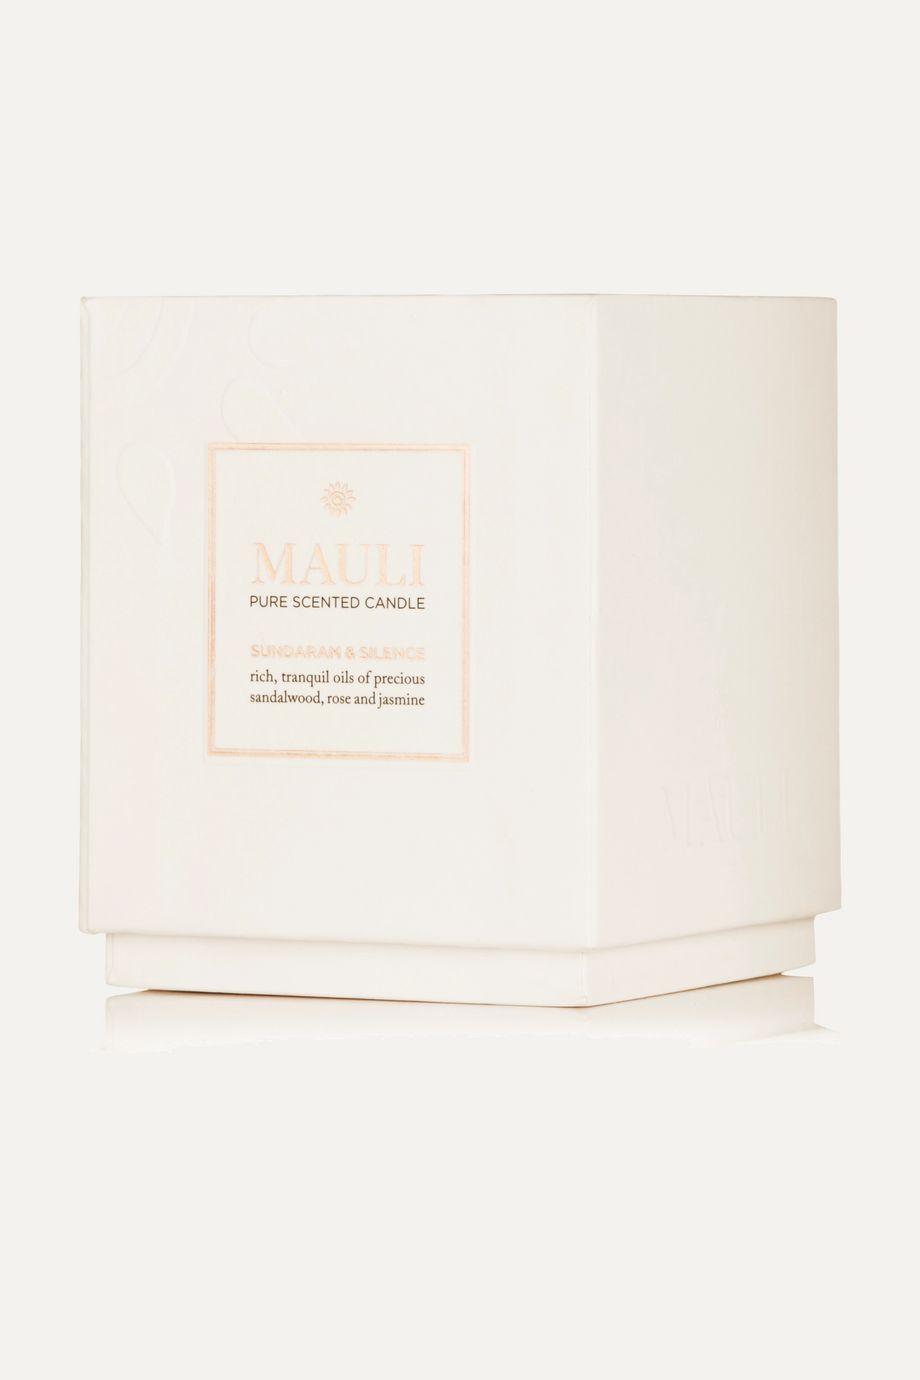 Mauli Rituals Sundaram & Silence scented candle, 210g